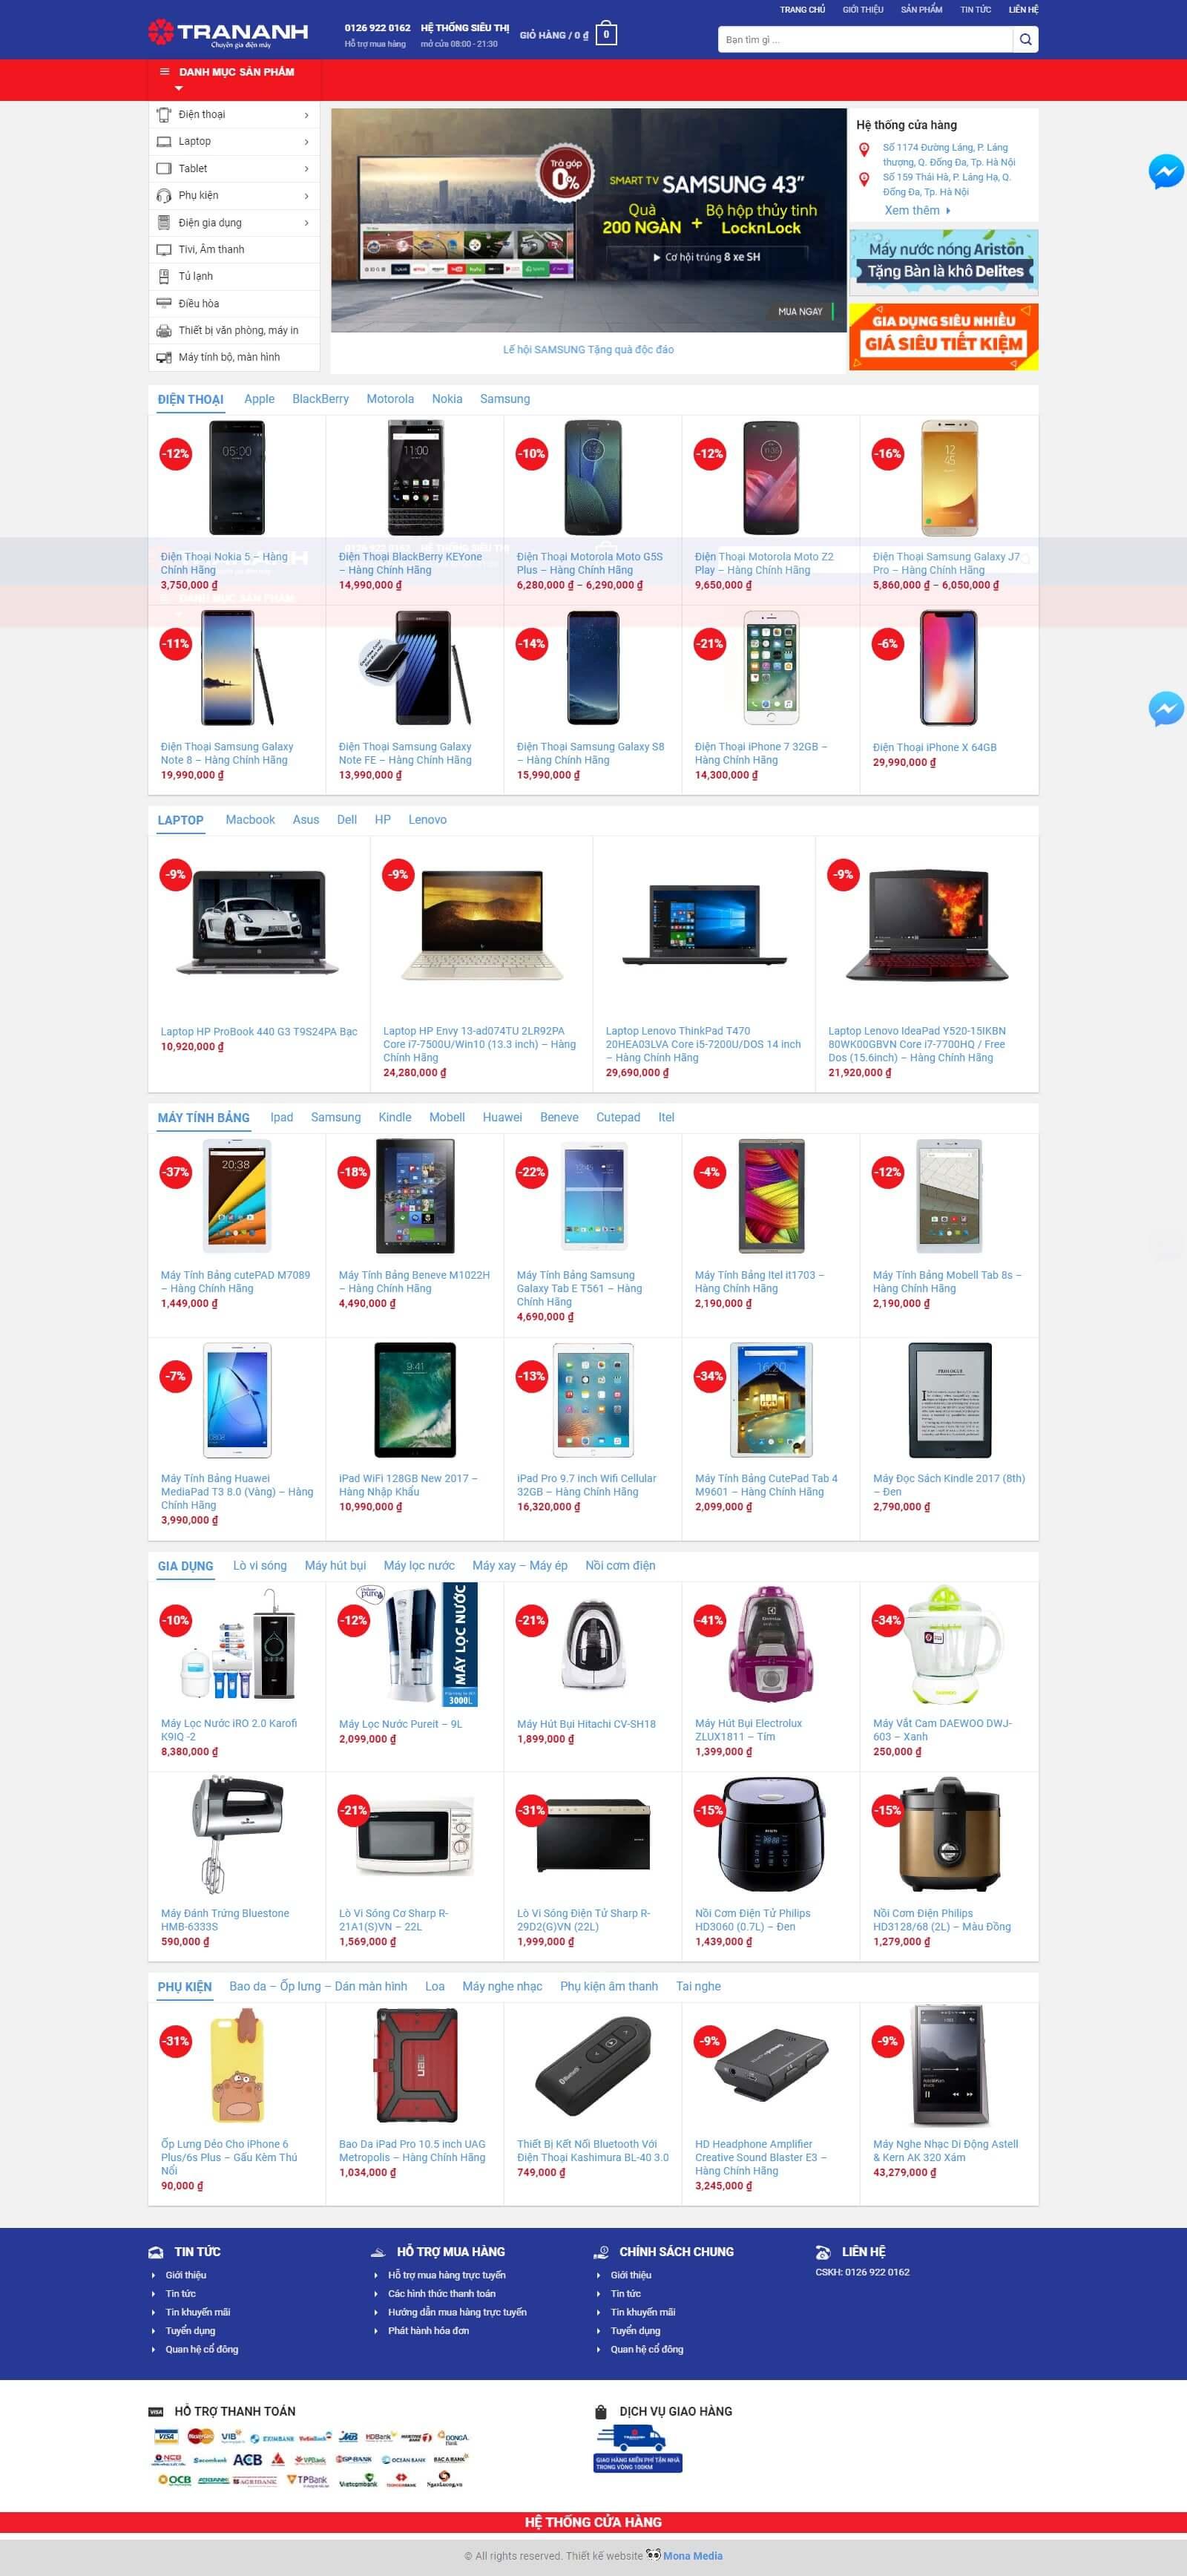 Mẫu website bán máy tính giống website Tran Anh